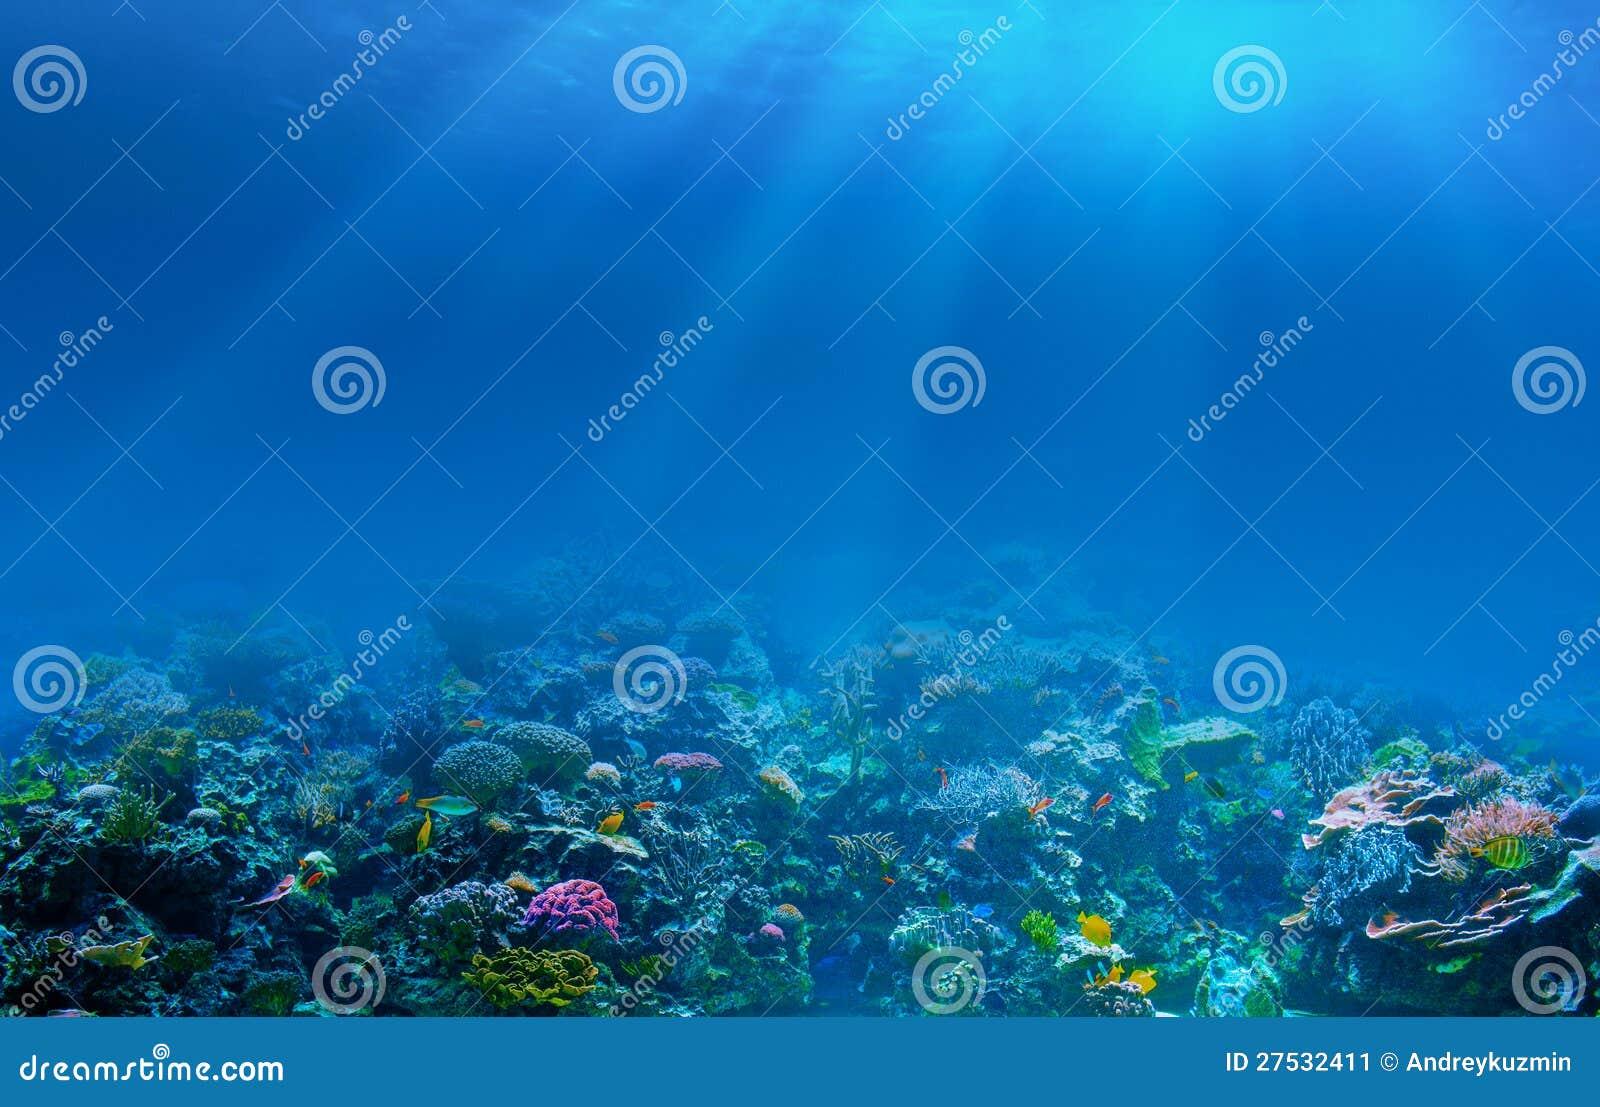 Underwater coral reef seabed background